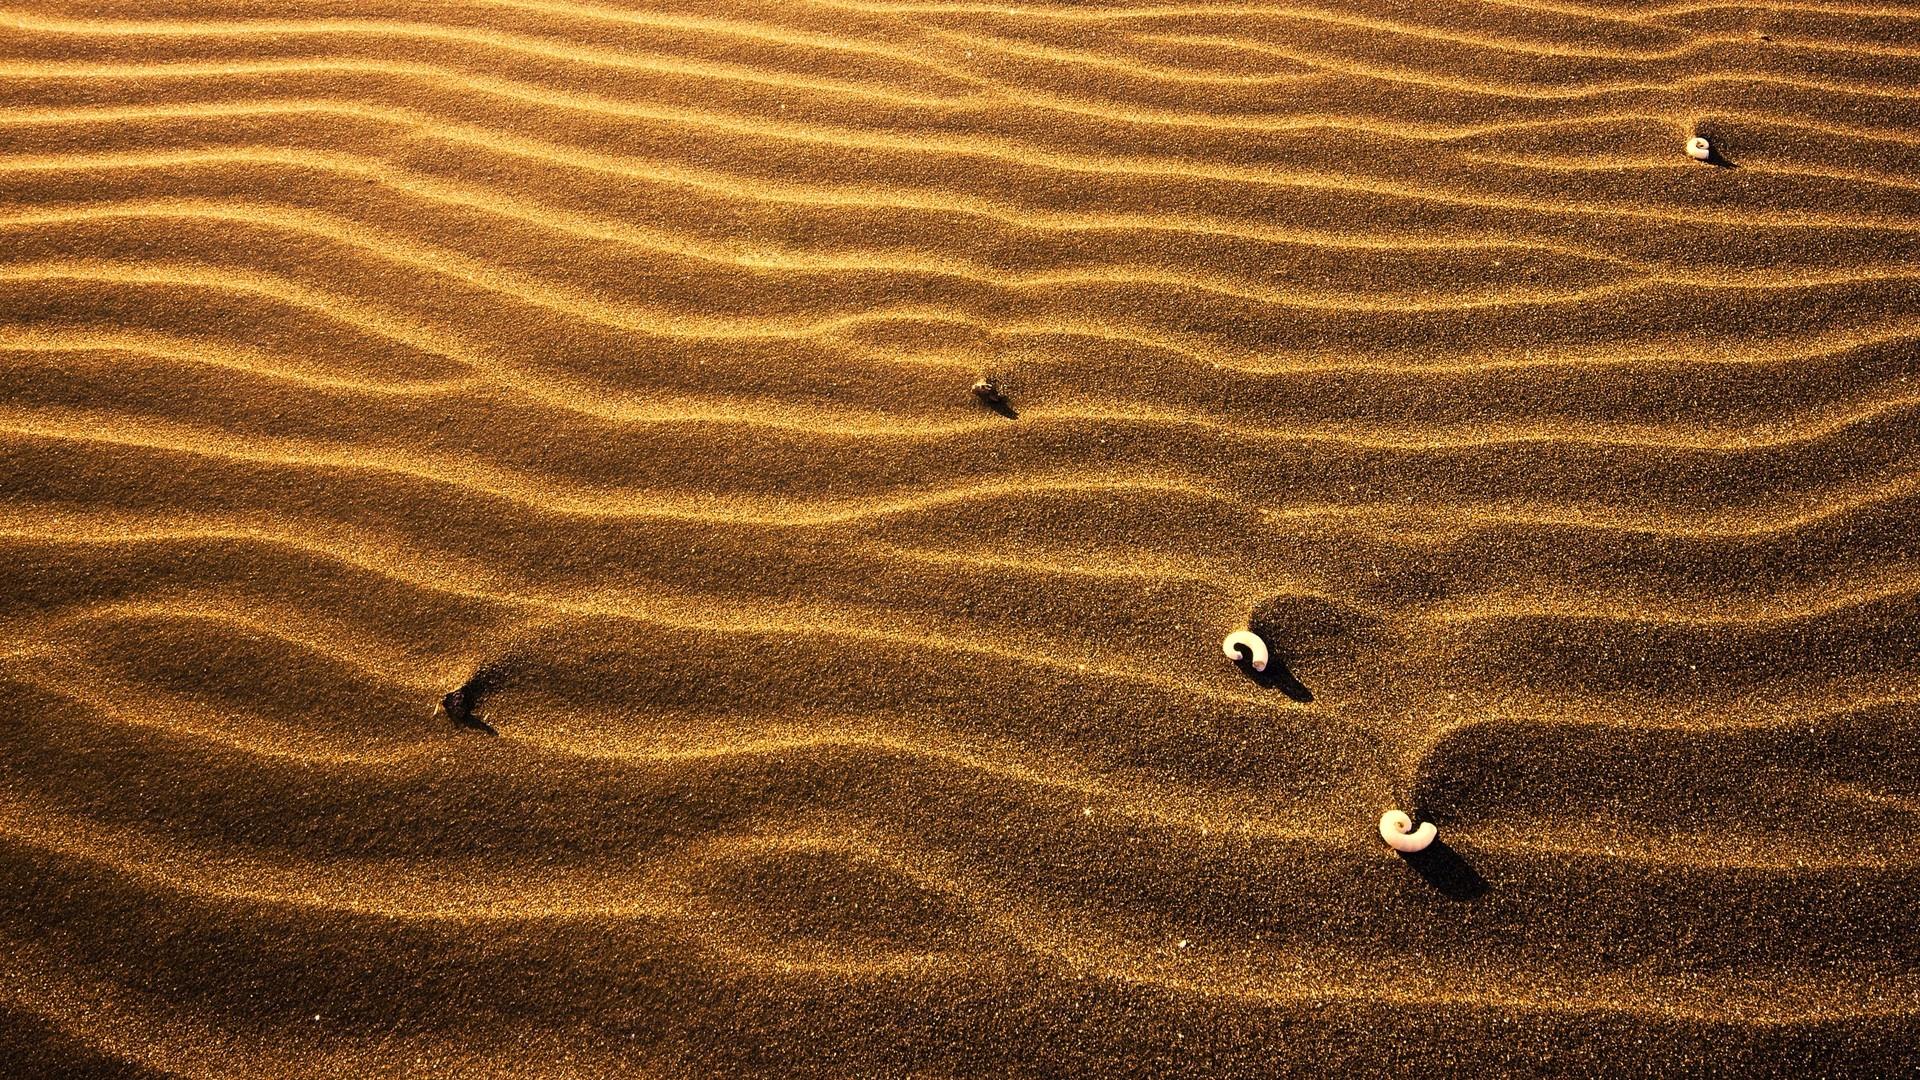 Sand wallpaper image hd